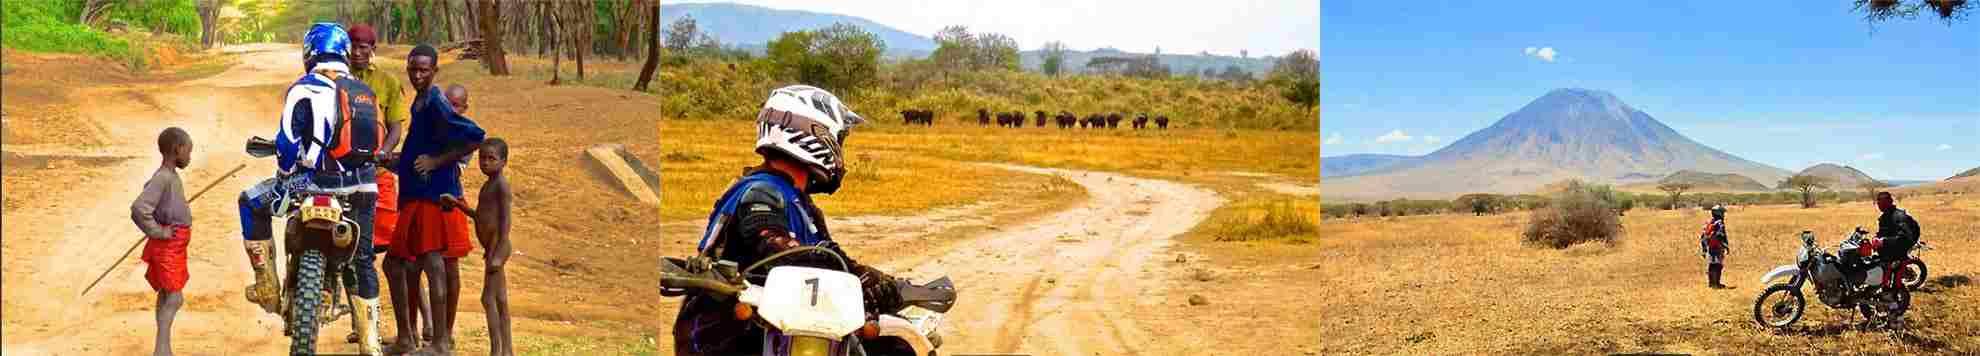 Moto safari authentique en tanzanie